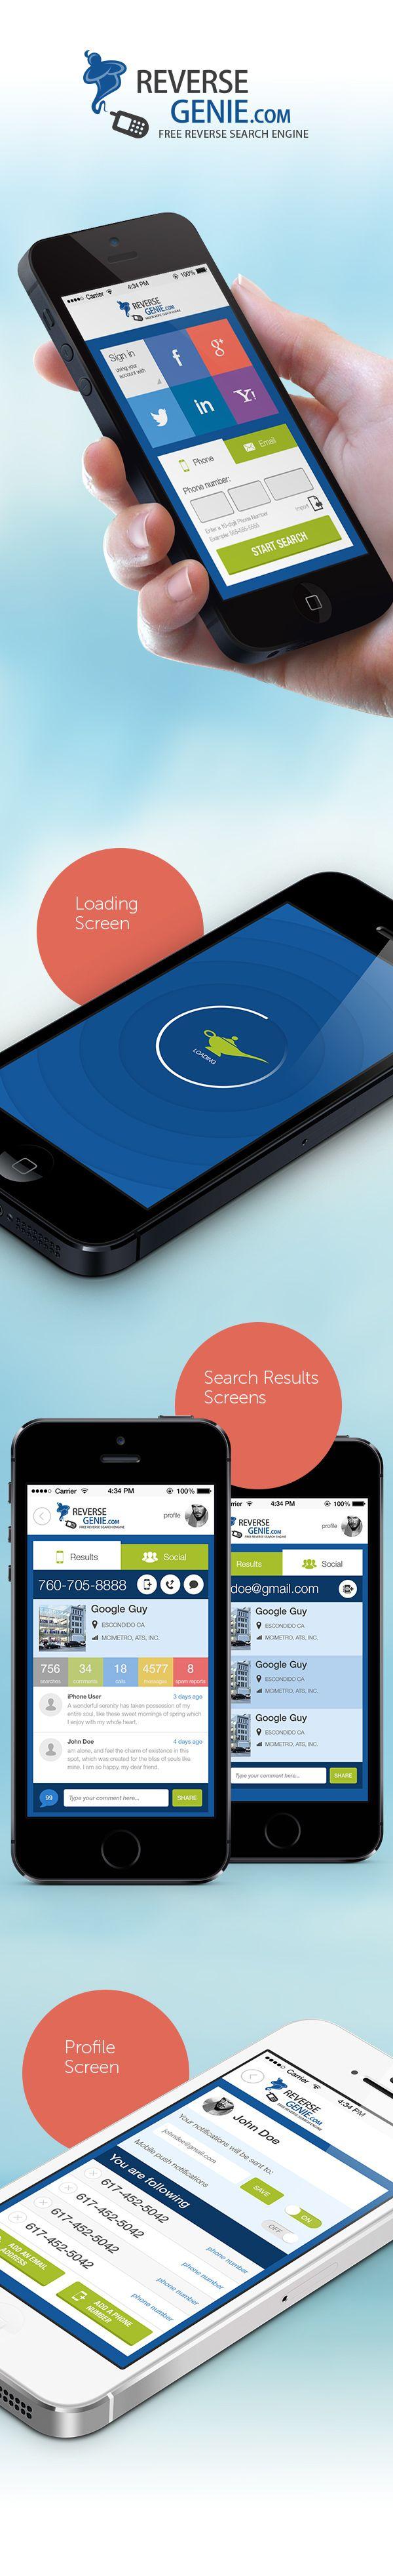 RG iOS App Design by Capcan, via Behance